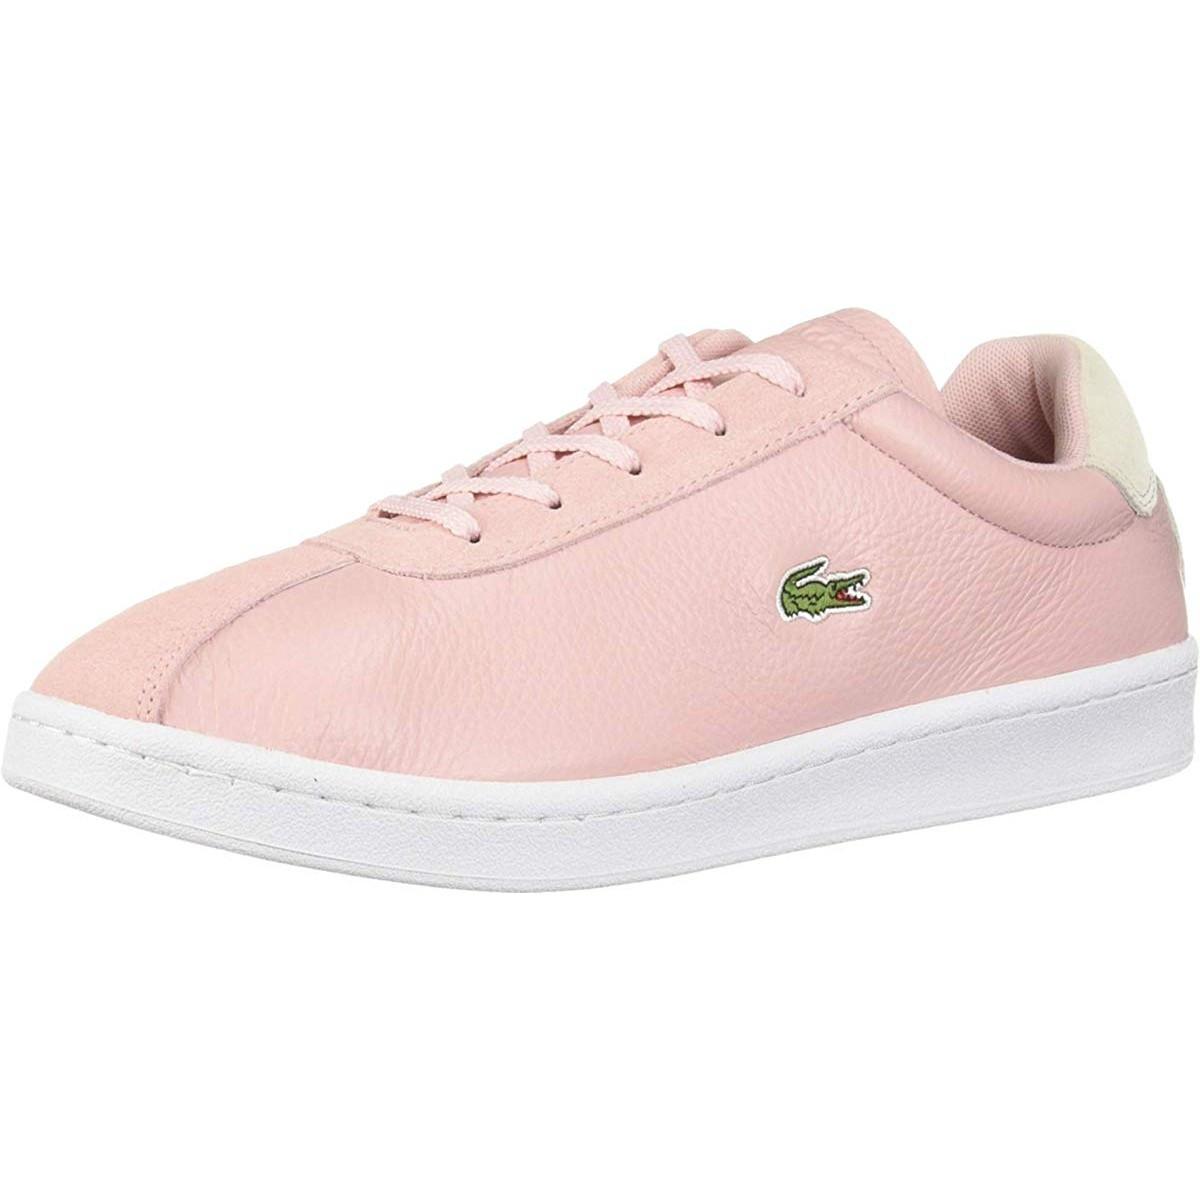 Кроссовки Lacoste Masters 119 2 Pink - Оригинал, фото 1